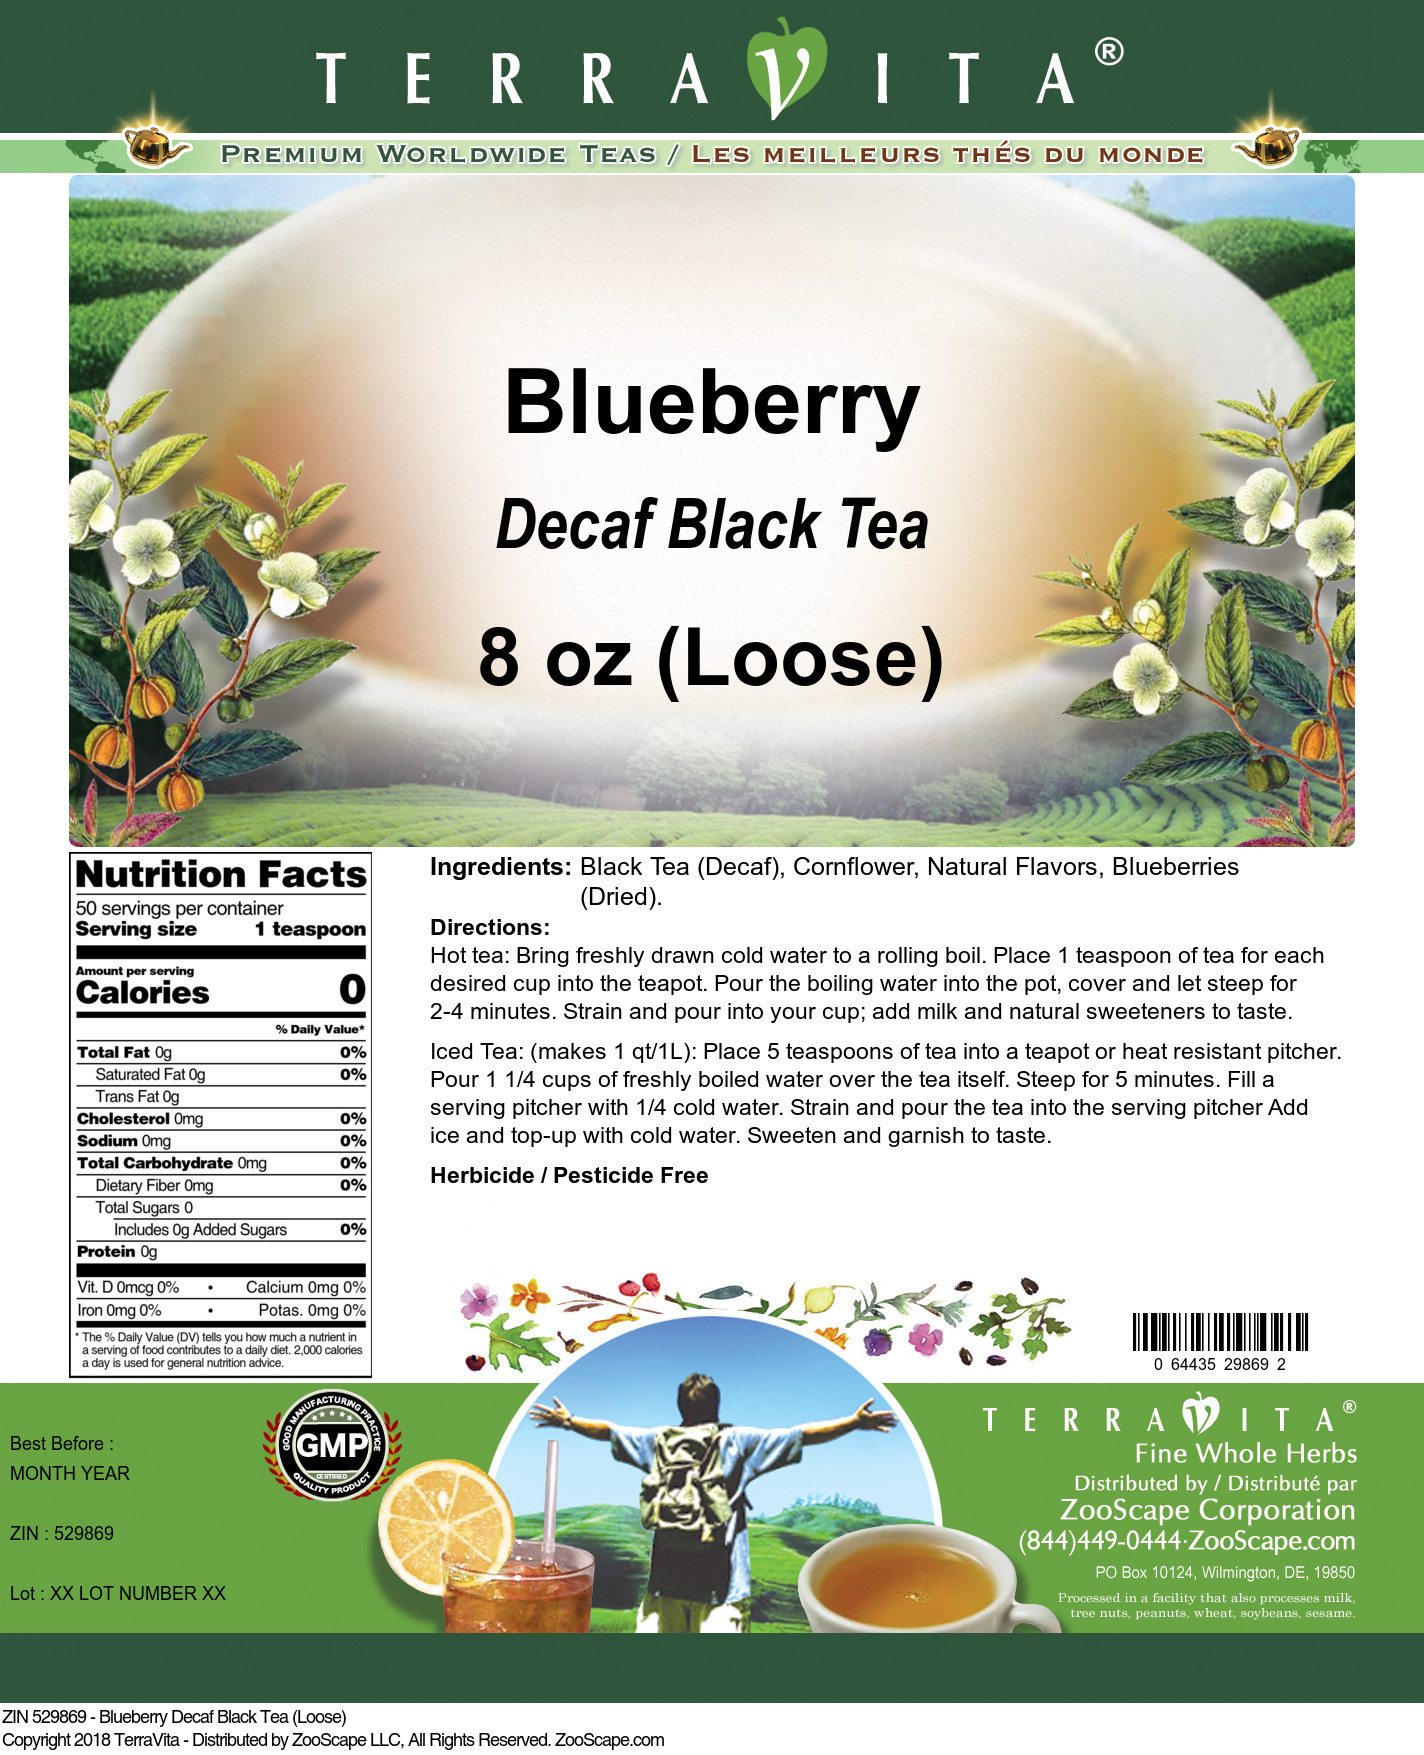 Blueberry Decaf Black Tea